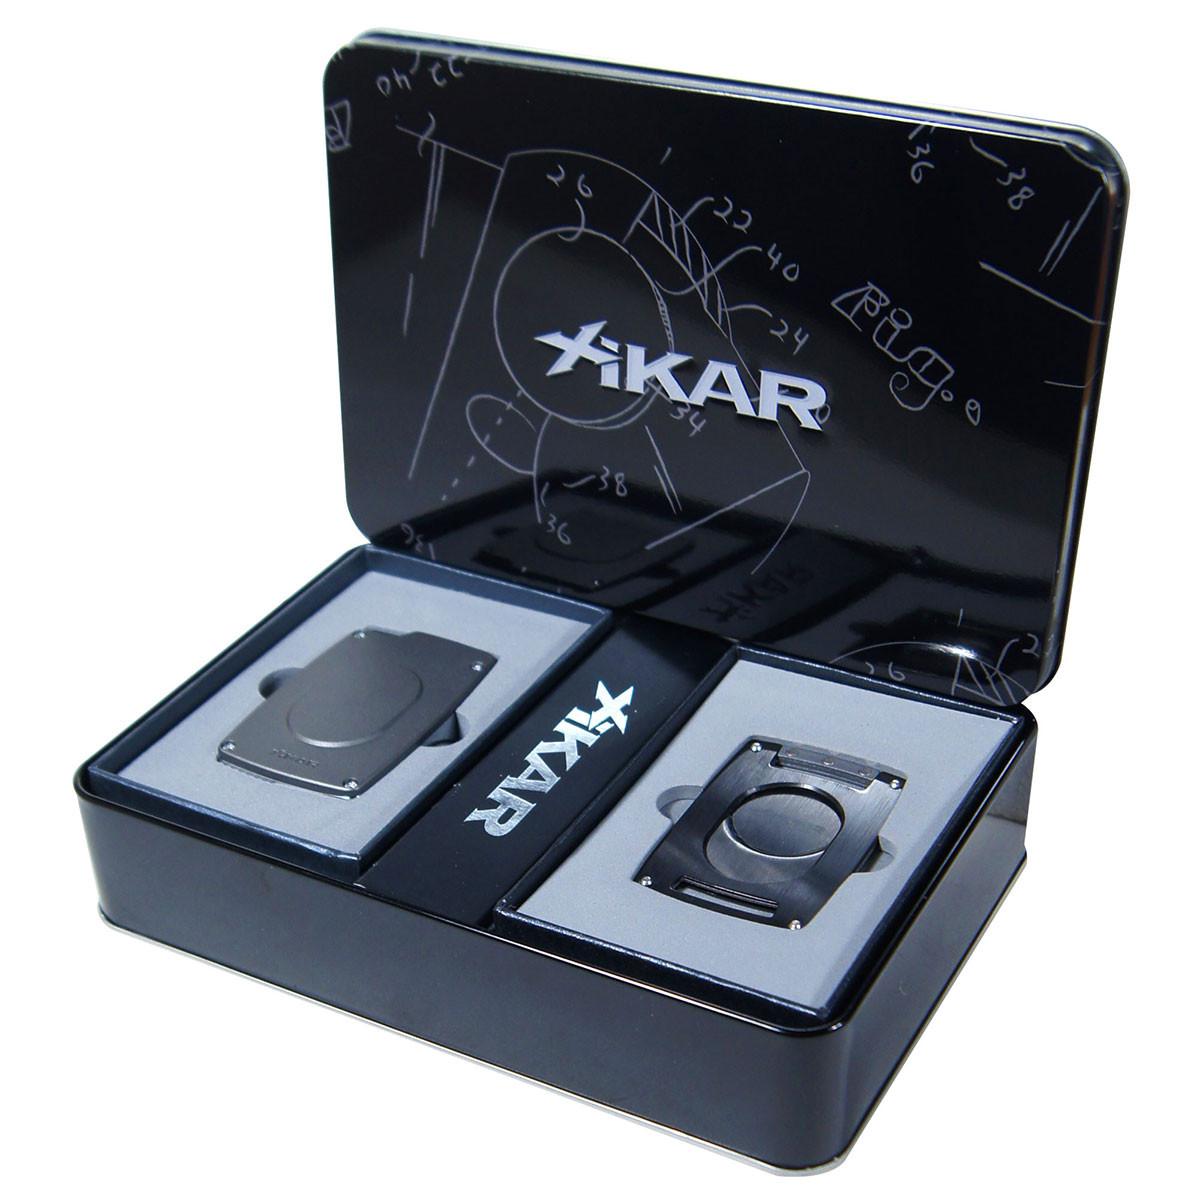 xikar cigar cutter ultra slim gunmetal gift set cubancrafters